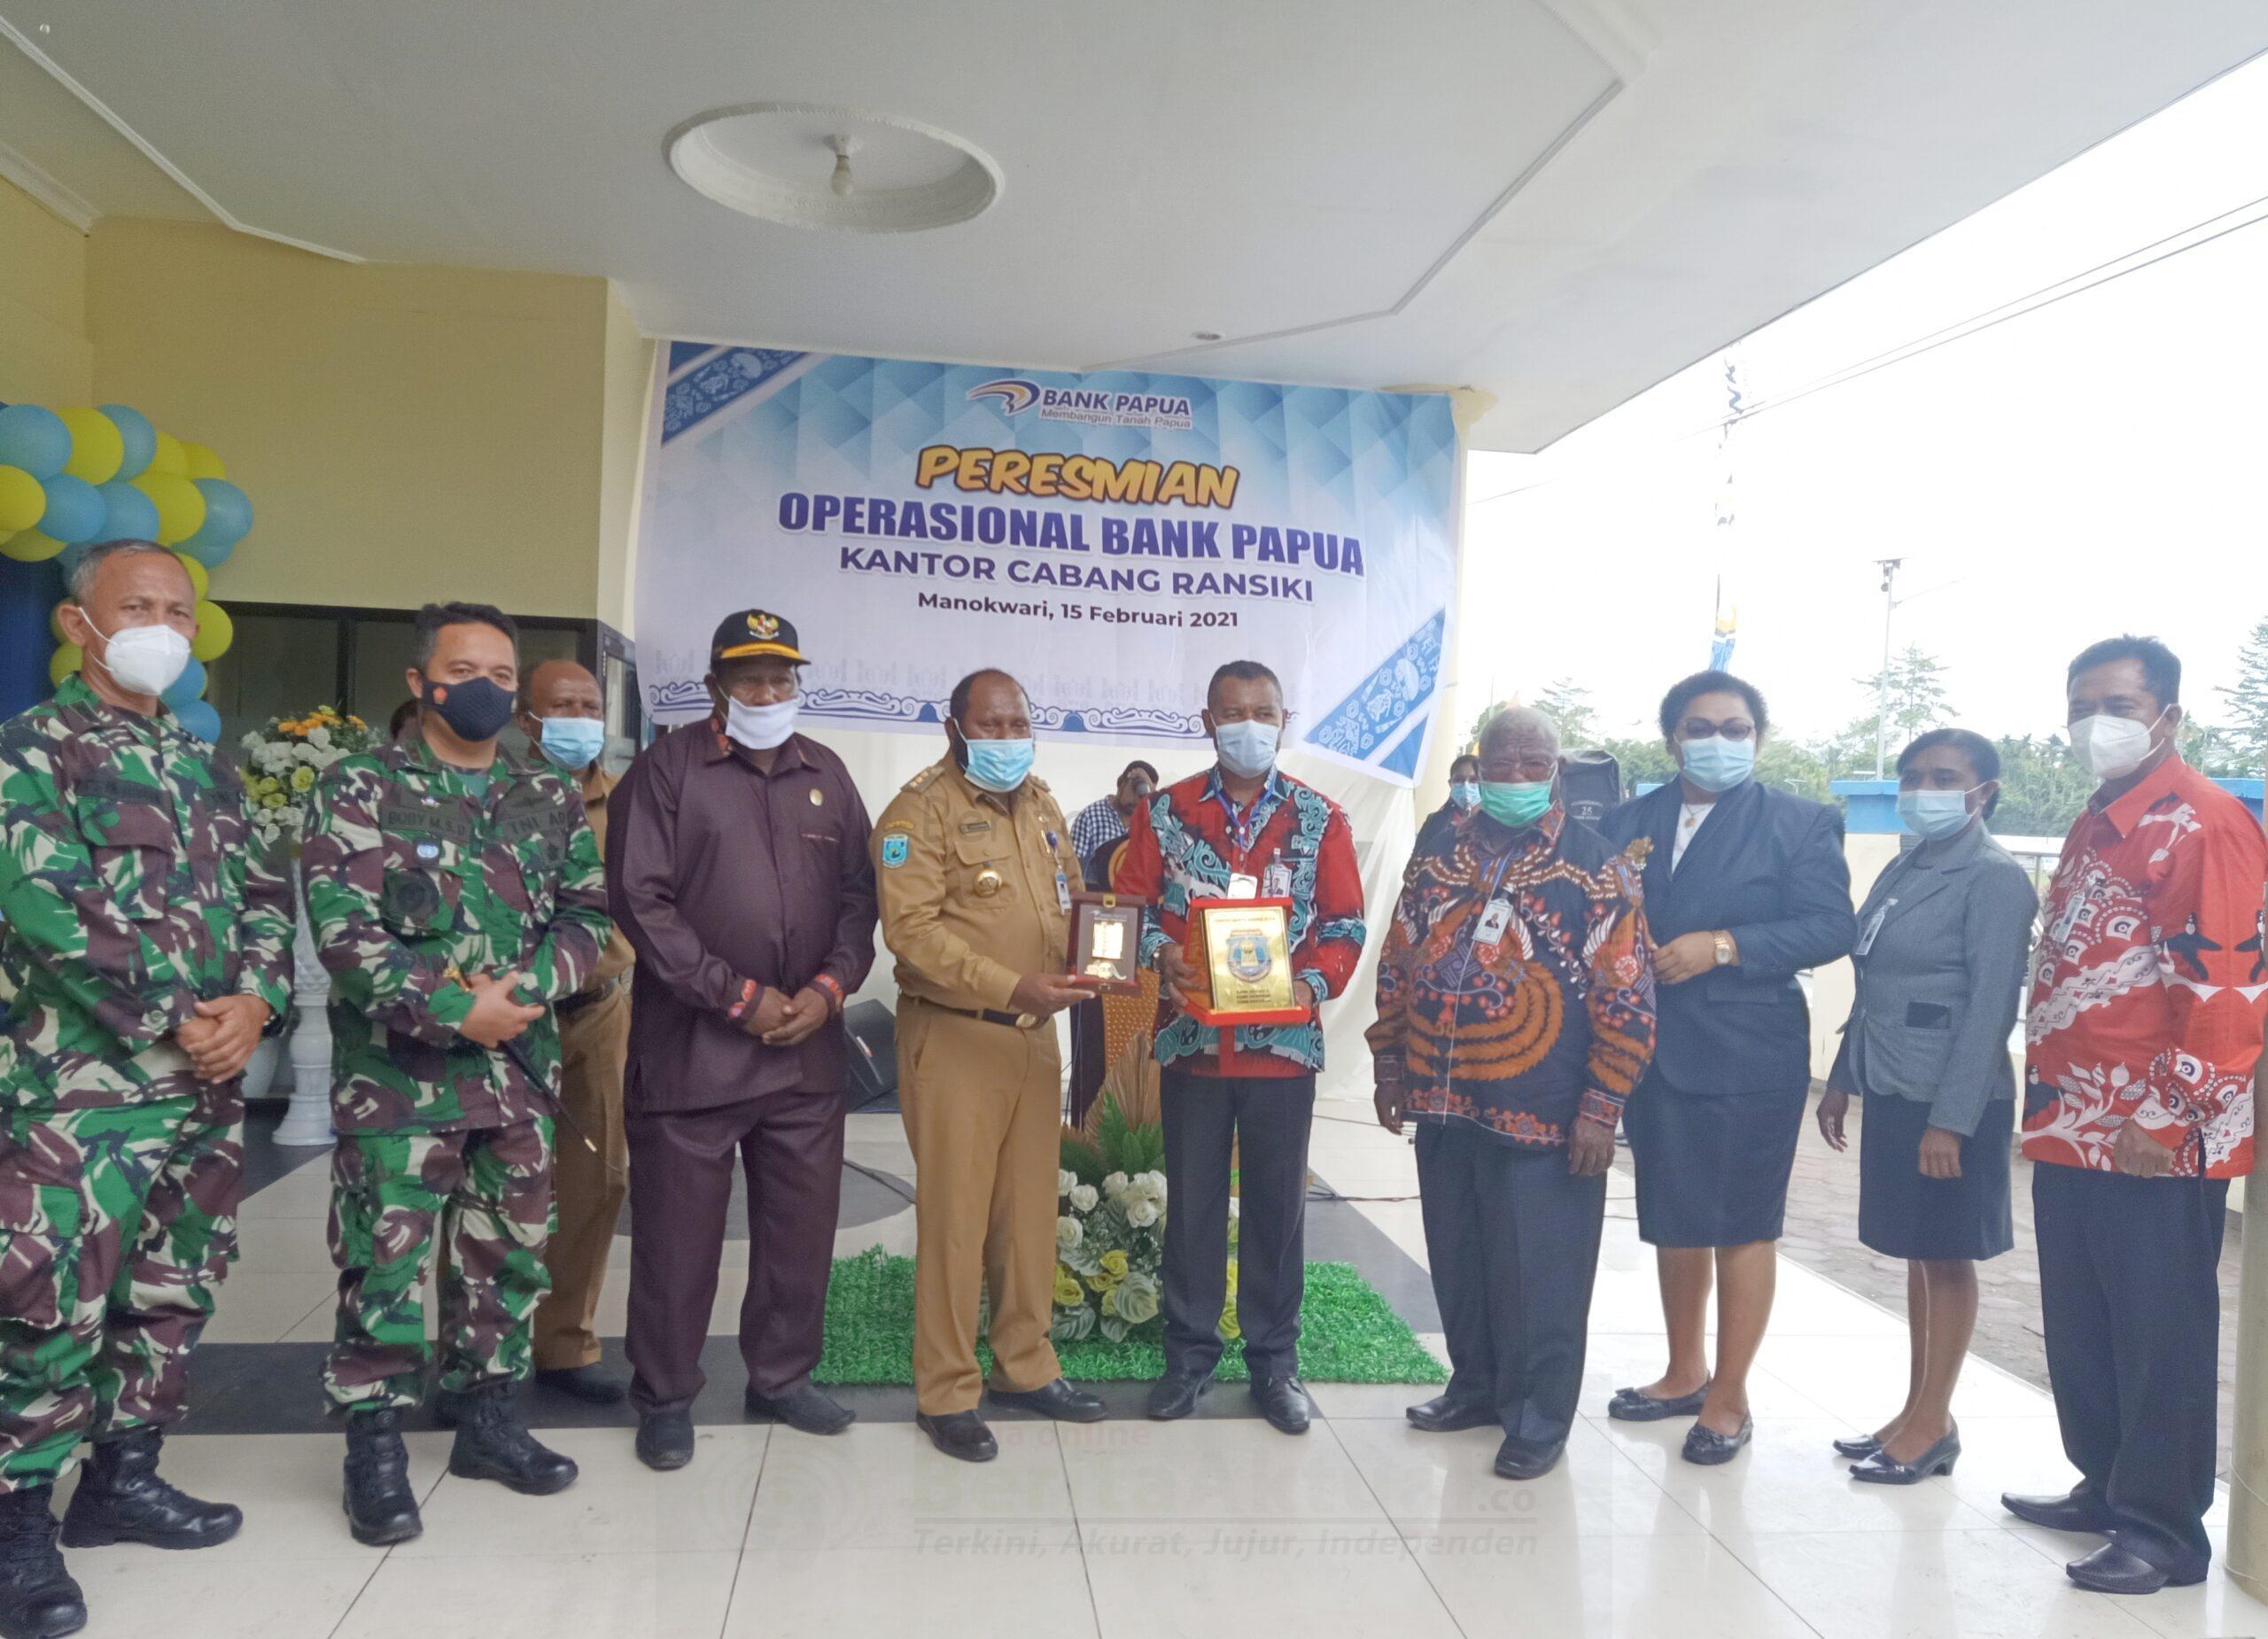 Bupati Manokwari Selatan, Resmikan KCP Ransiki Menjadi Kantor Cabang Bank Papua 16 IMG 20210215 224557 scaled